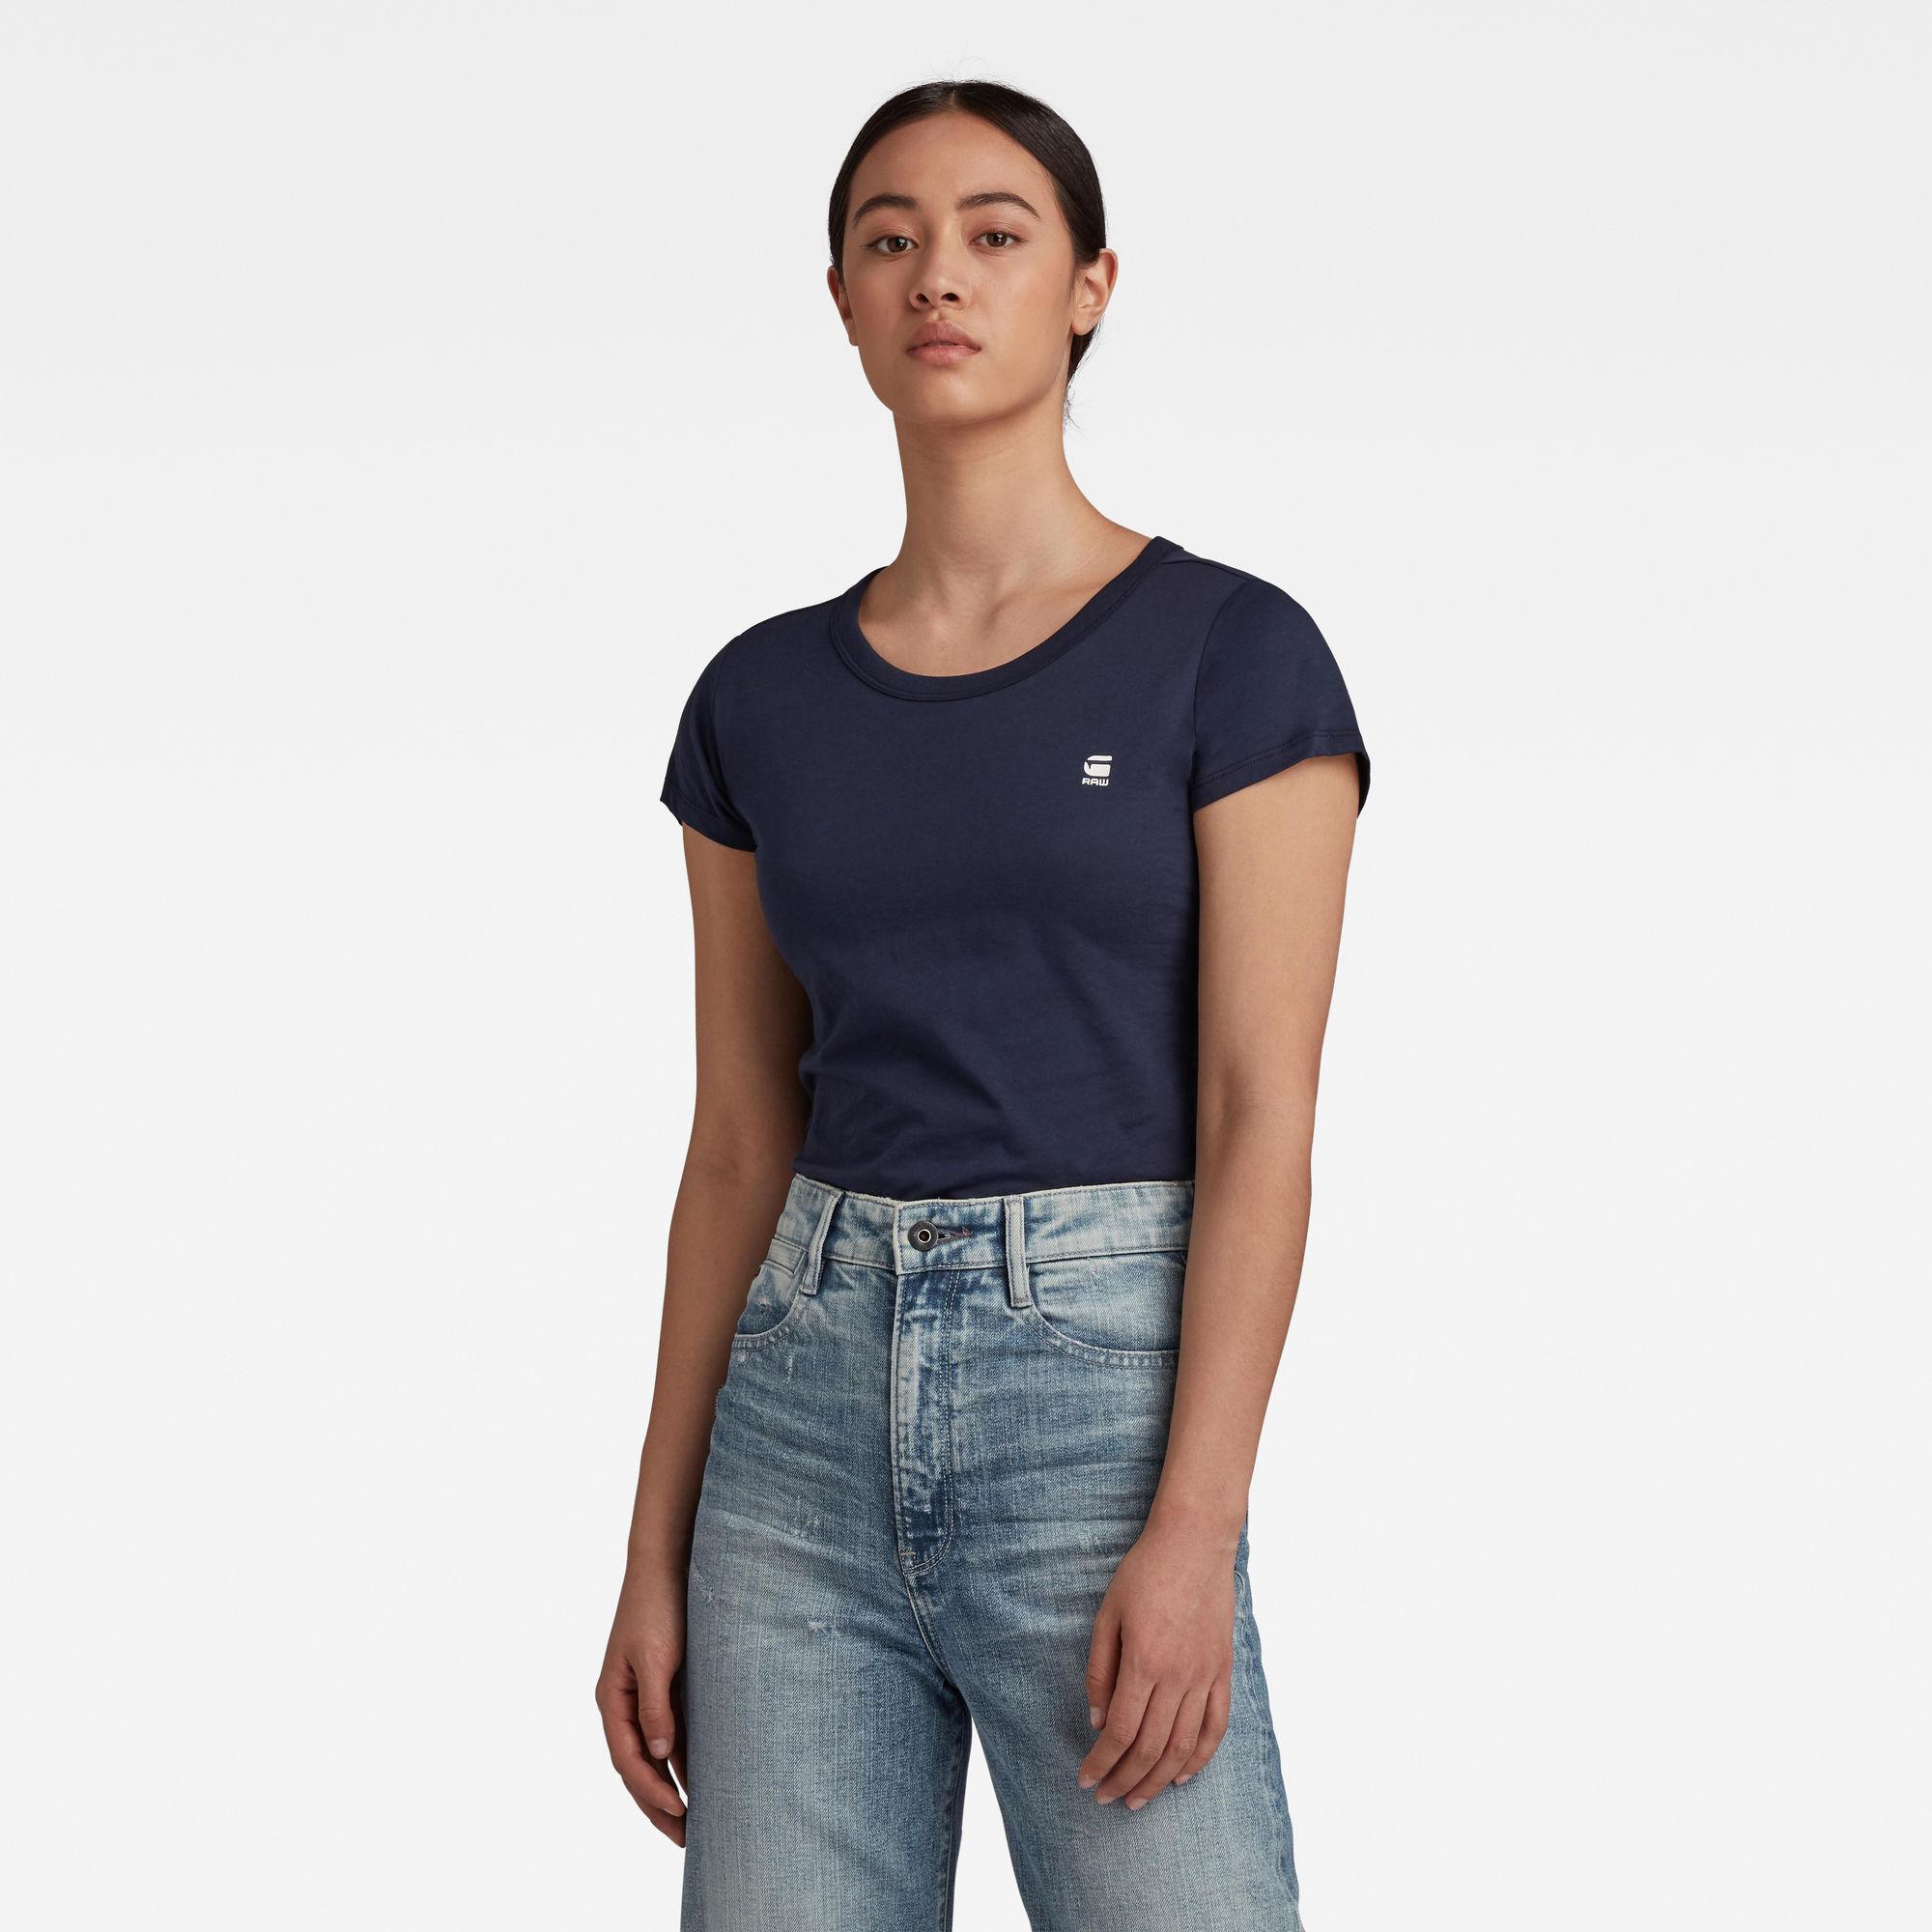 Image of G Star Raw Eyben Slim T-Shirt